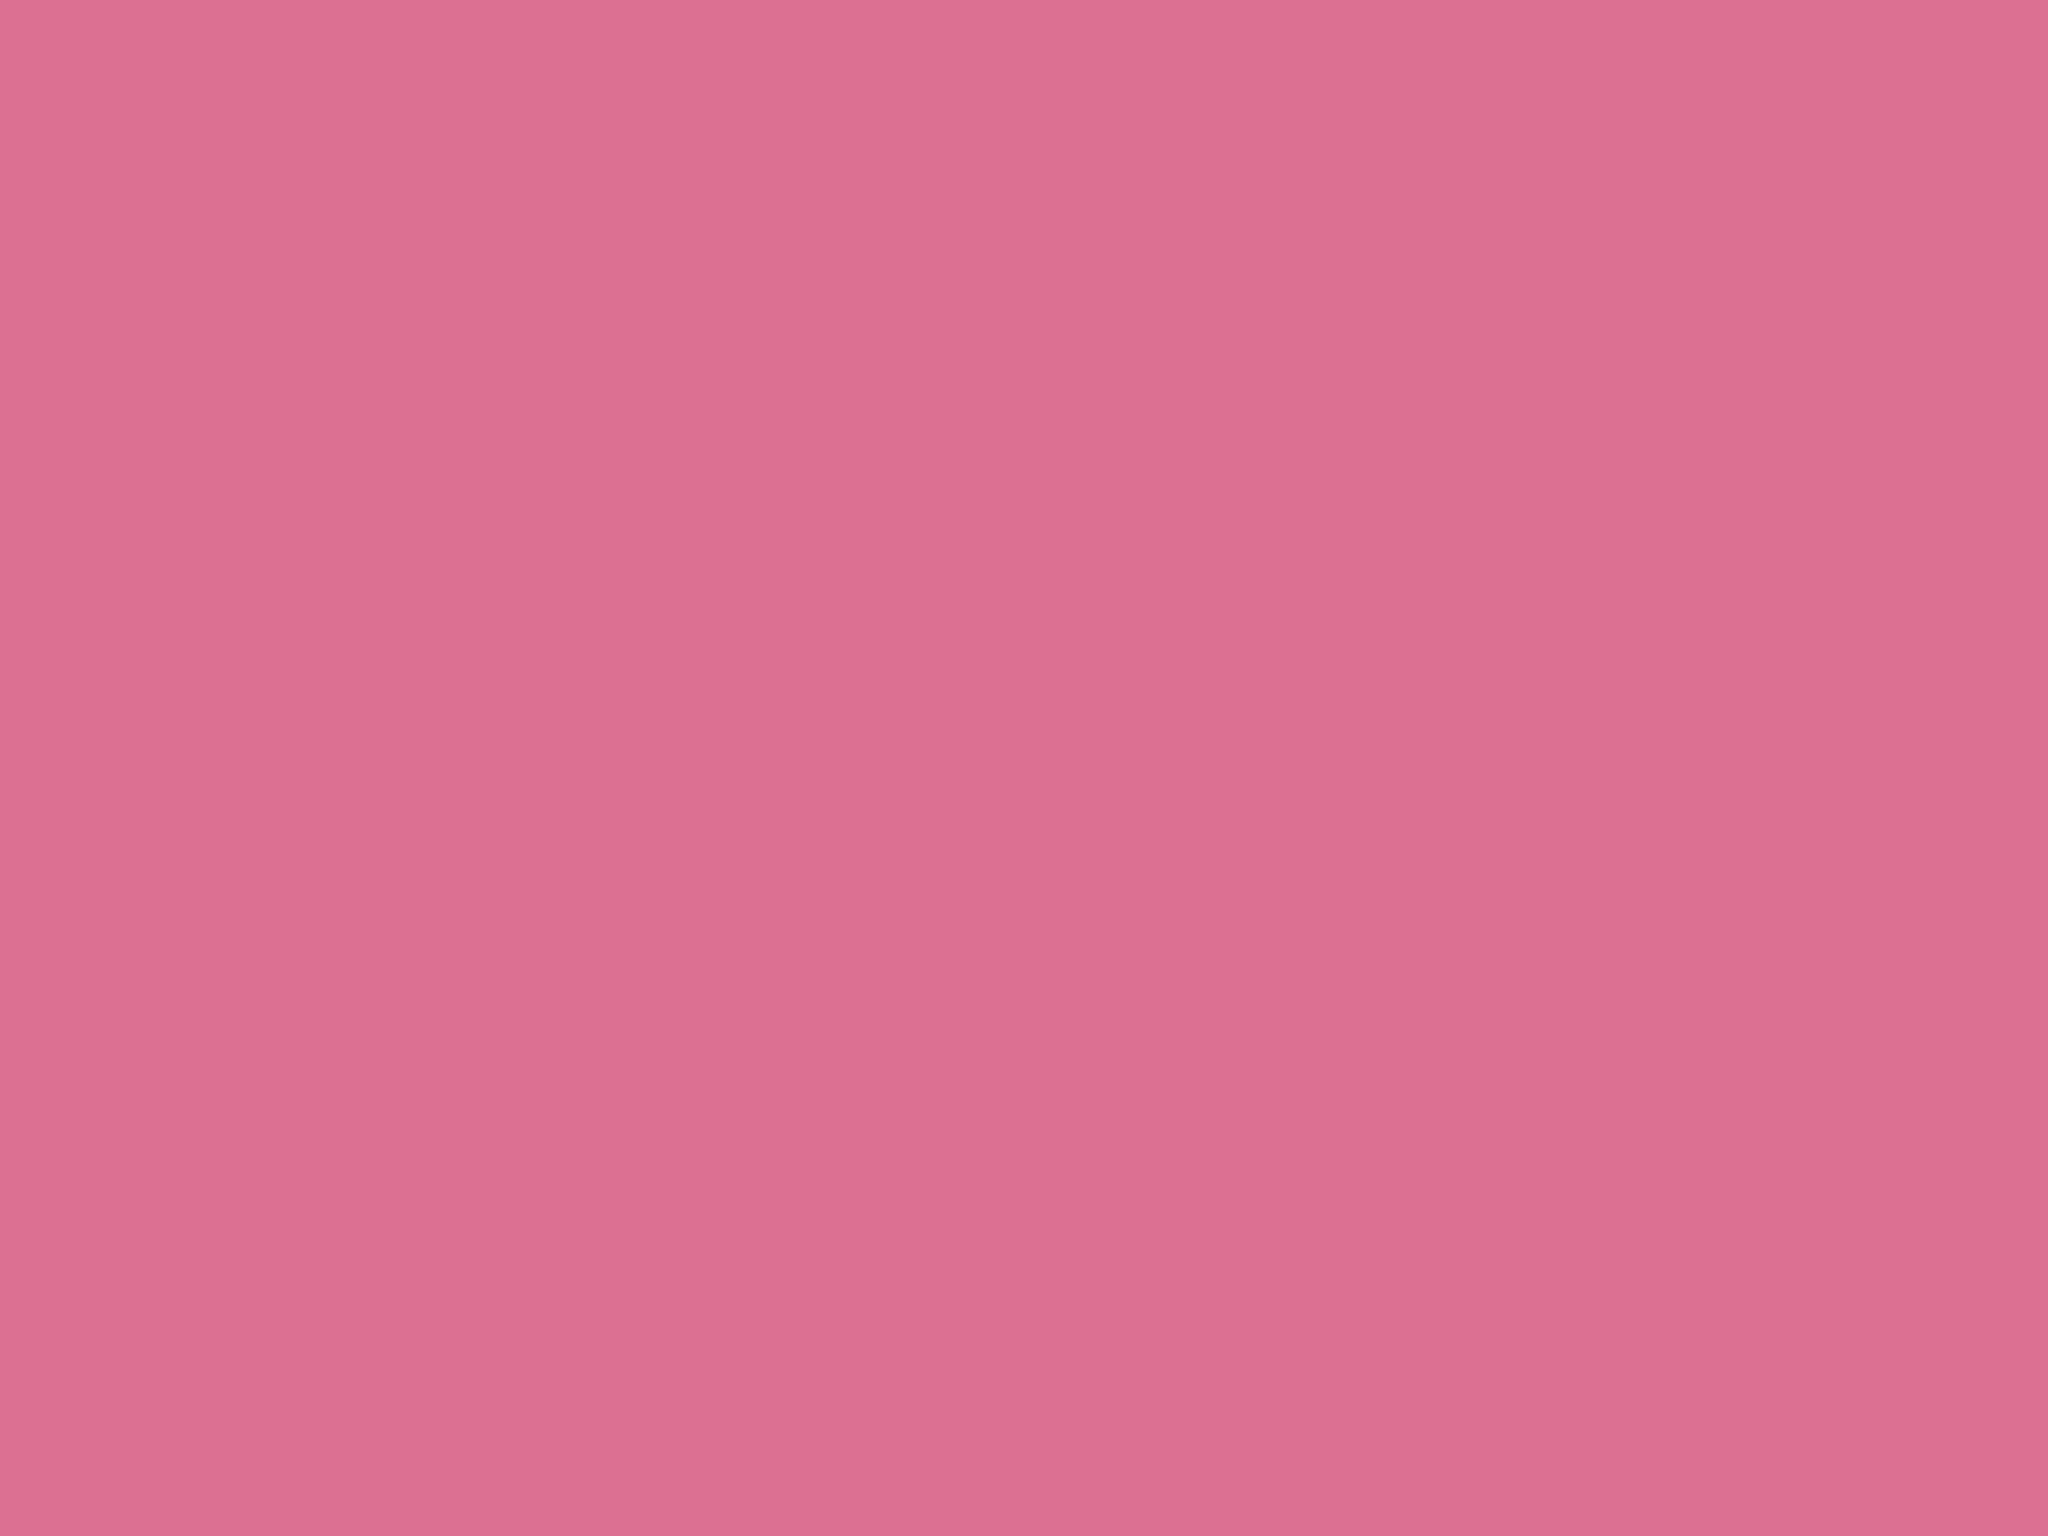 2048x1536 Pale Red-violet Solid Color Background